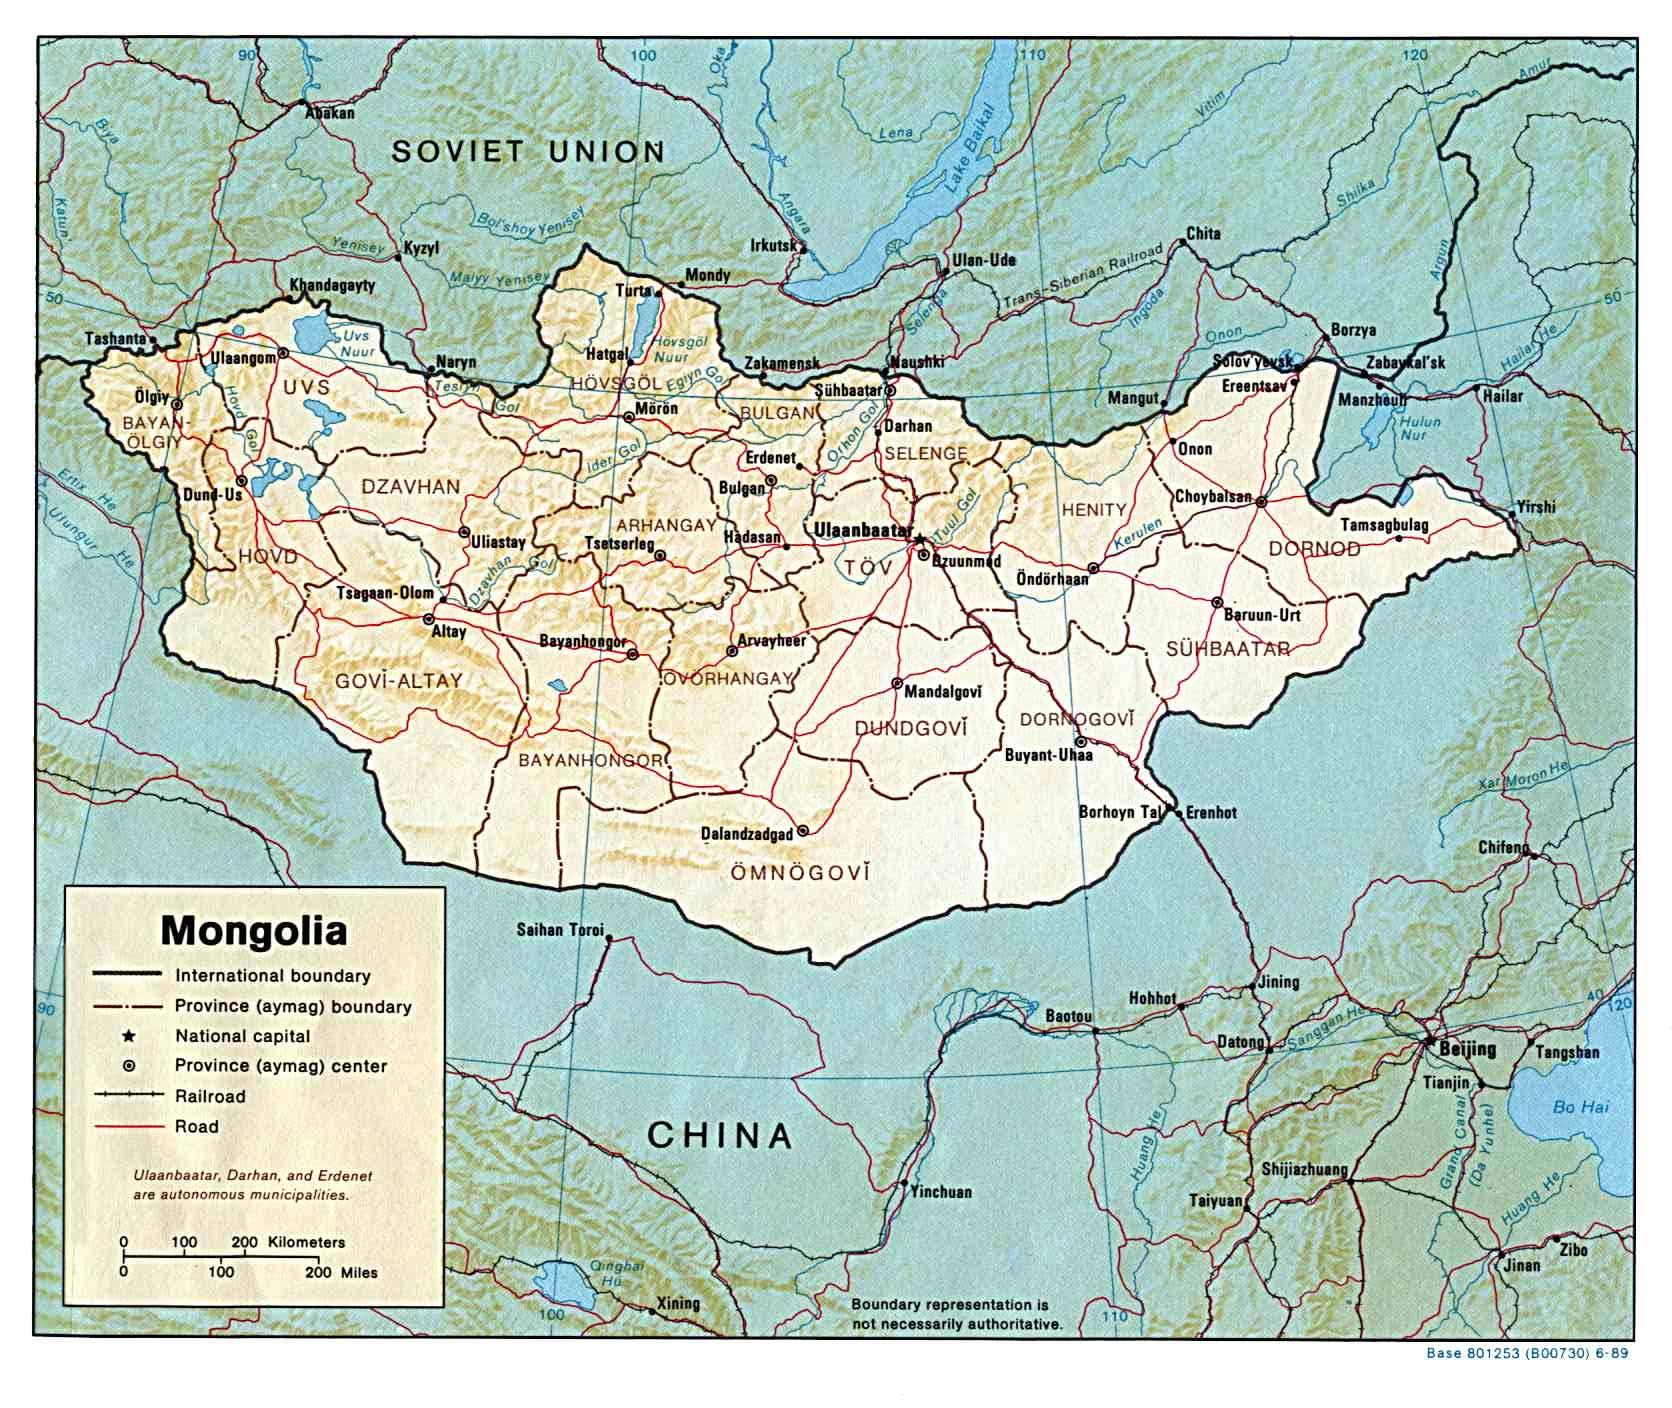 Mongolian neo-Nazis: Anti-Chinese sentiment fuels rise of ultra-nationalism